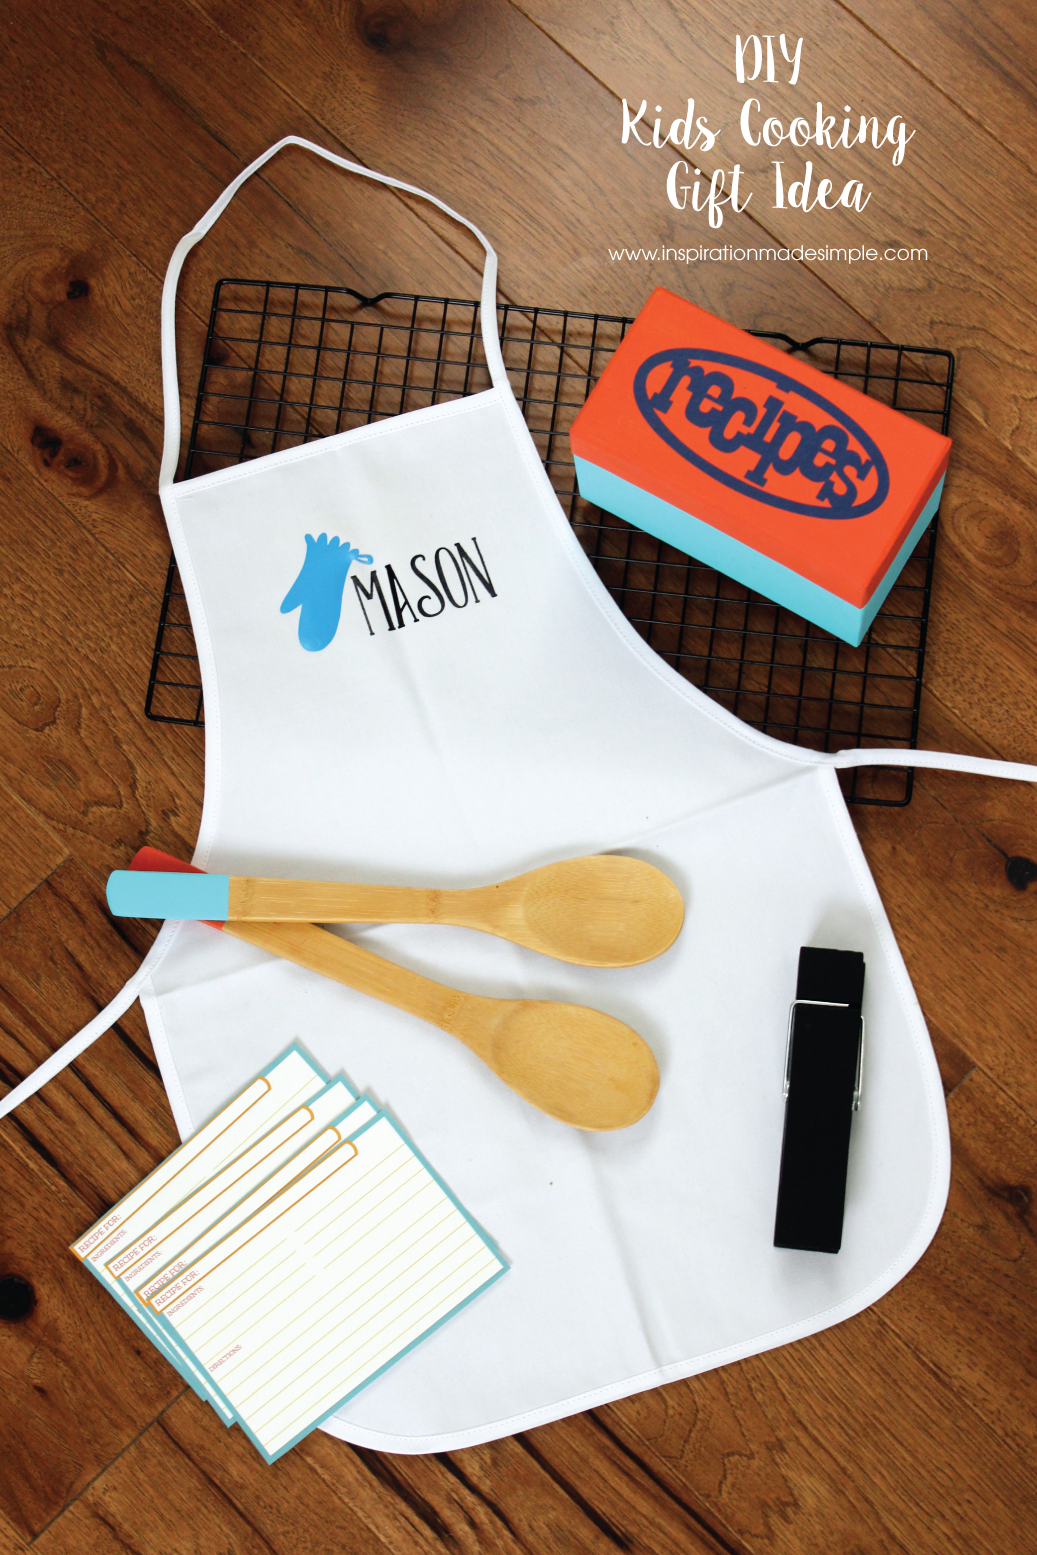 DIY Kids Cooking Gift Idea